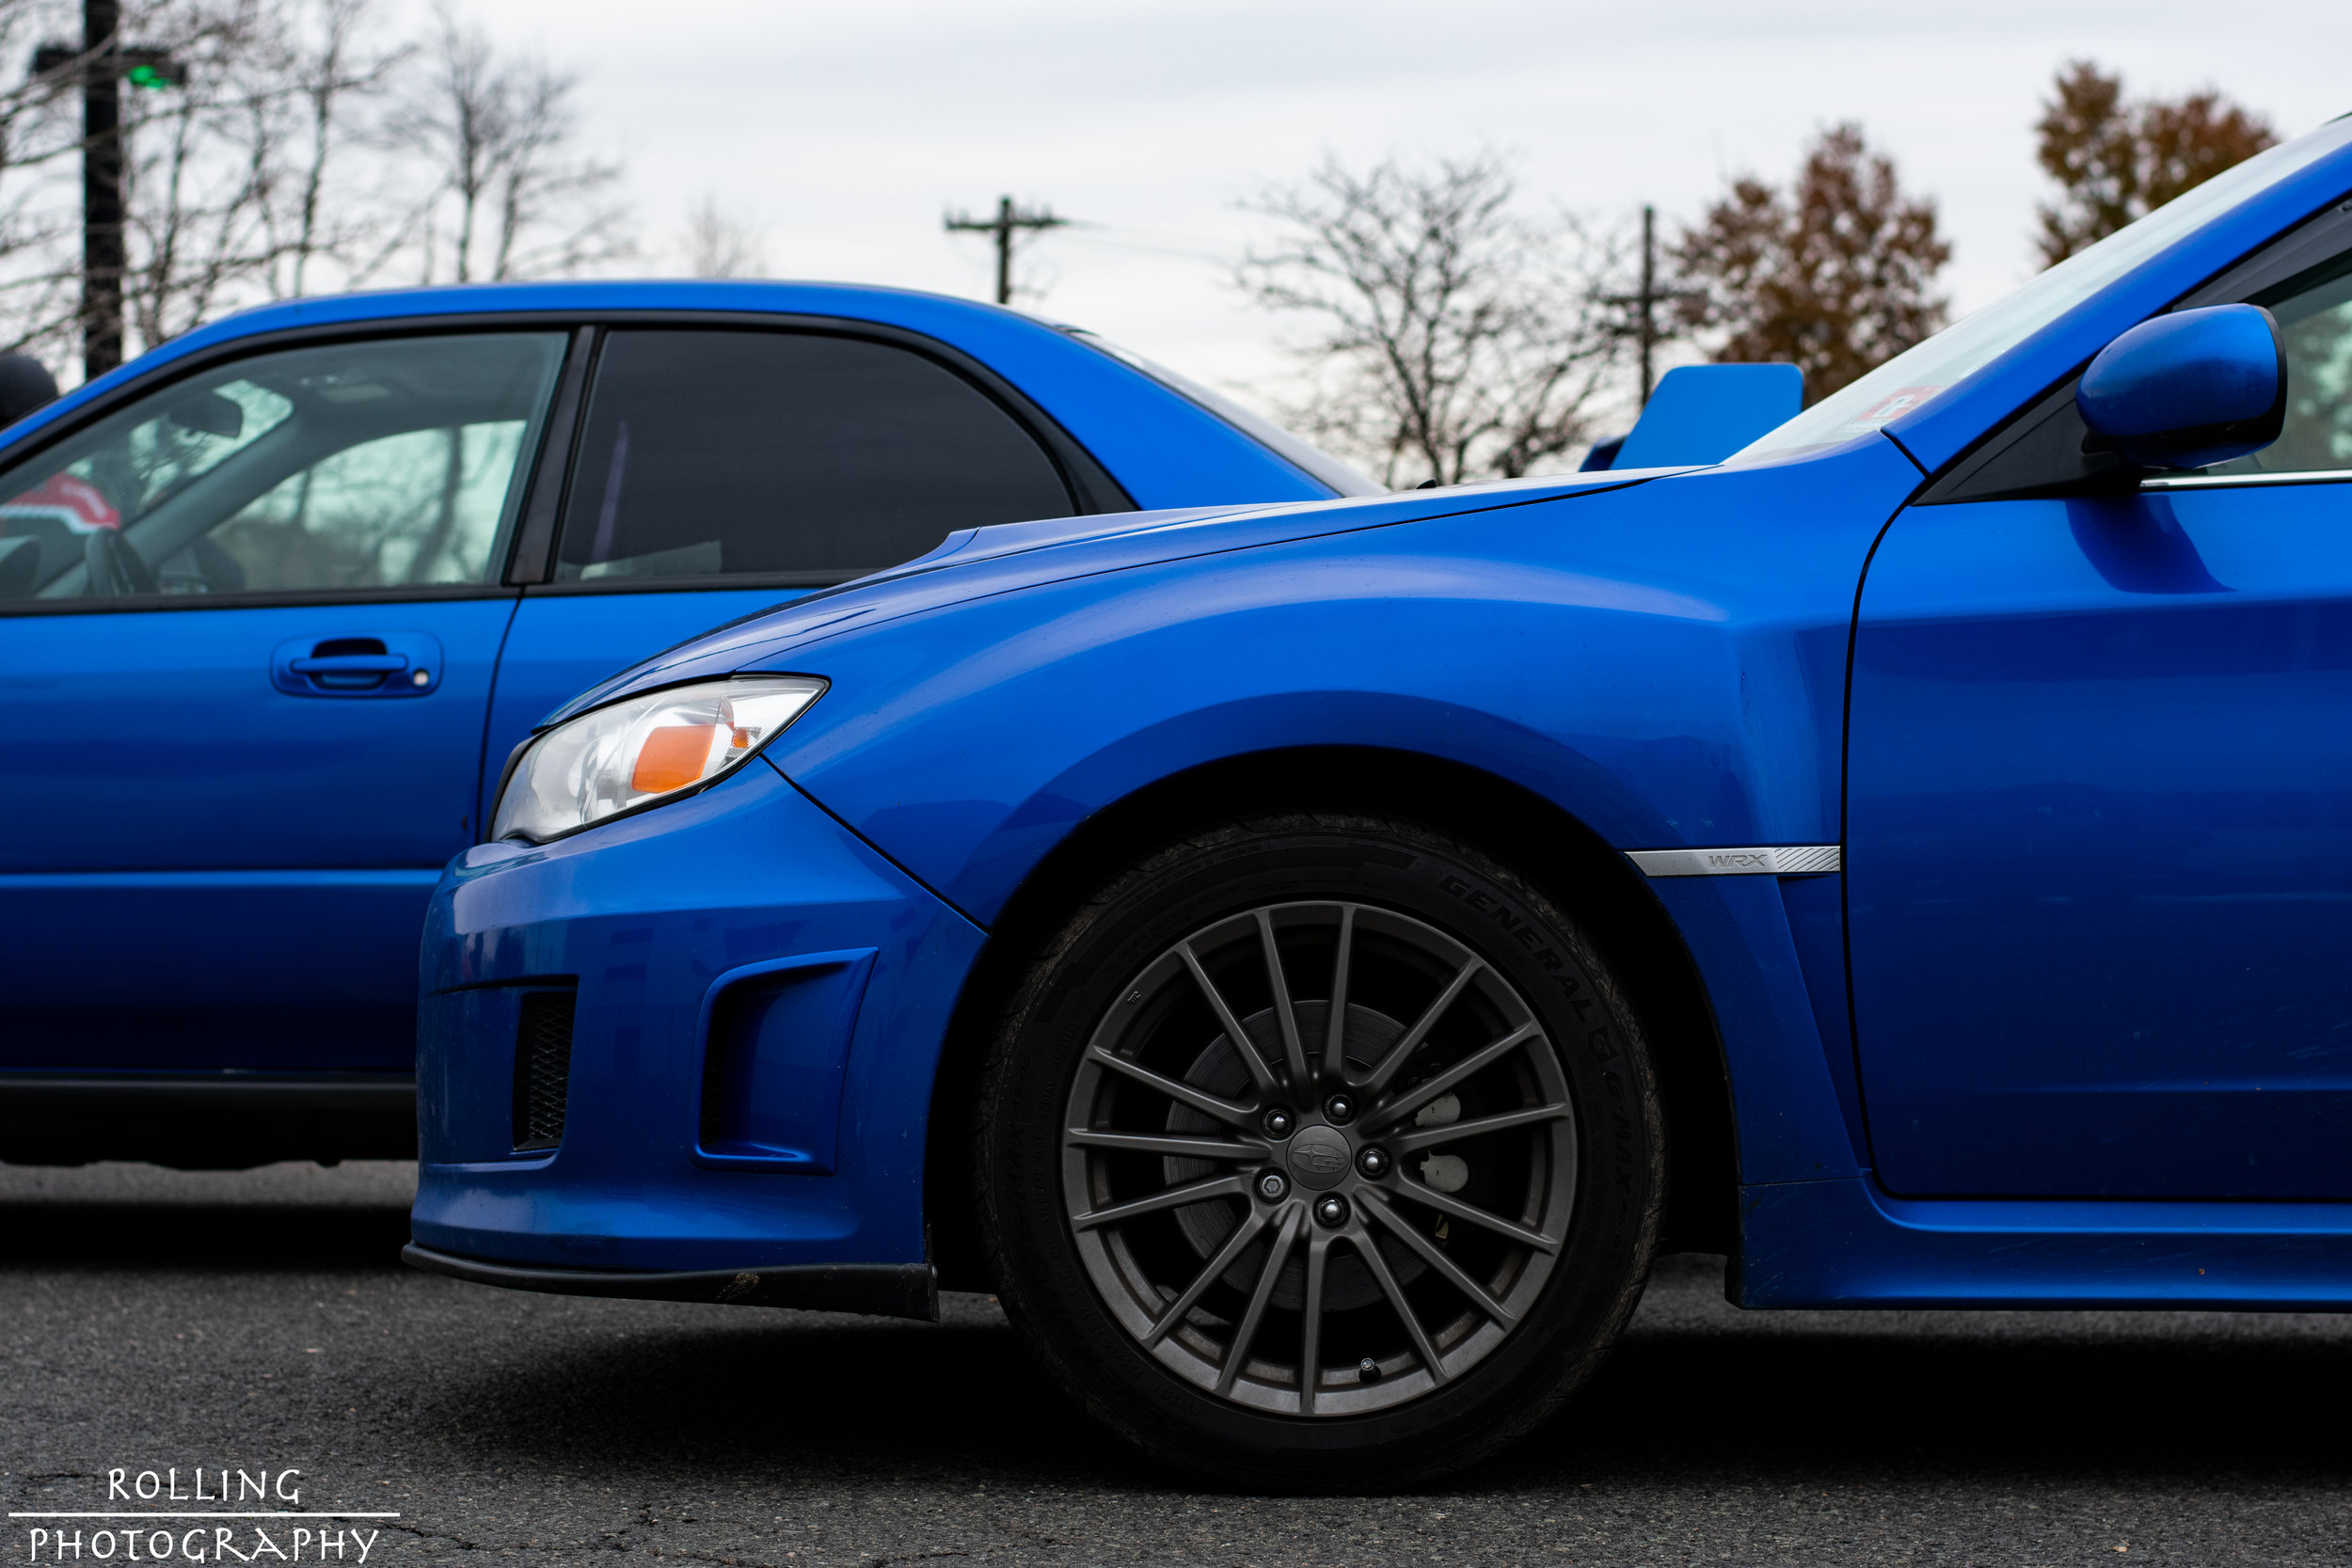 Subaru Impreza WRX  @trizzlebeanlatte   ISO 200, 50mm, f / 4.5 ShutterSpeed 1/500